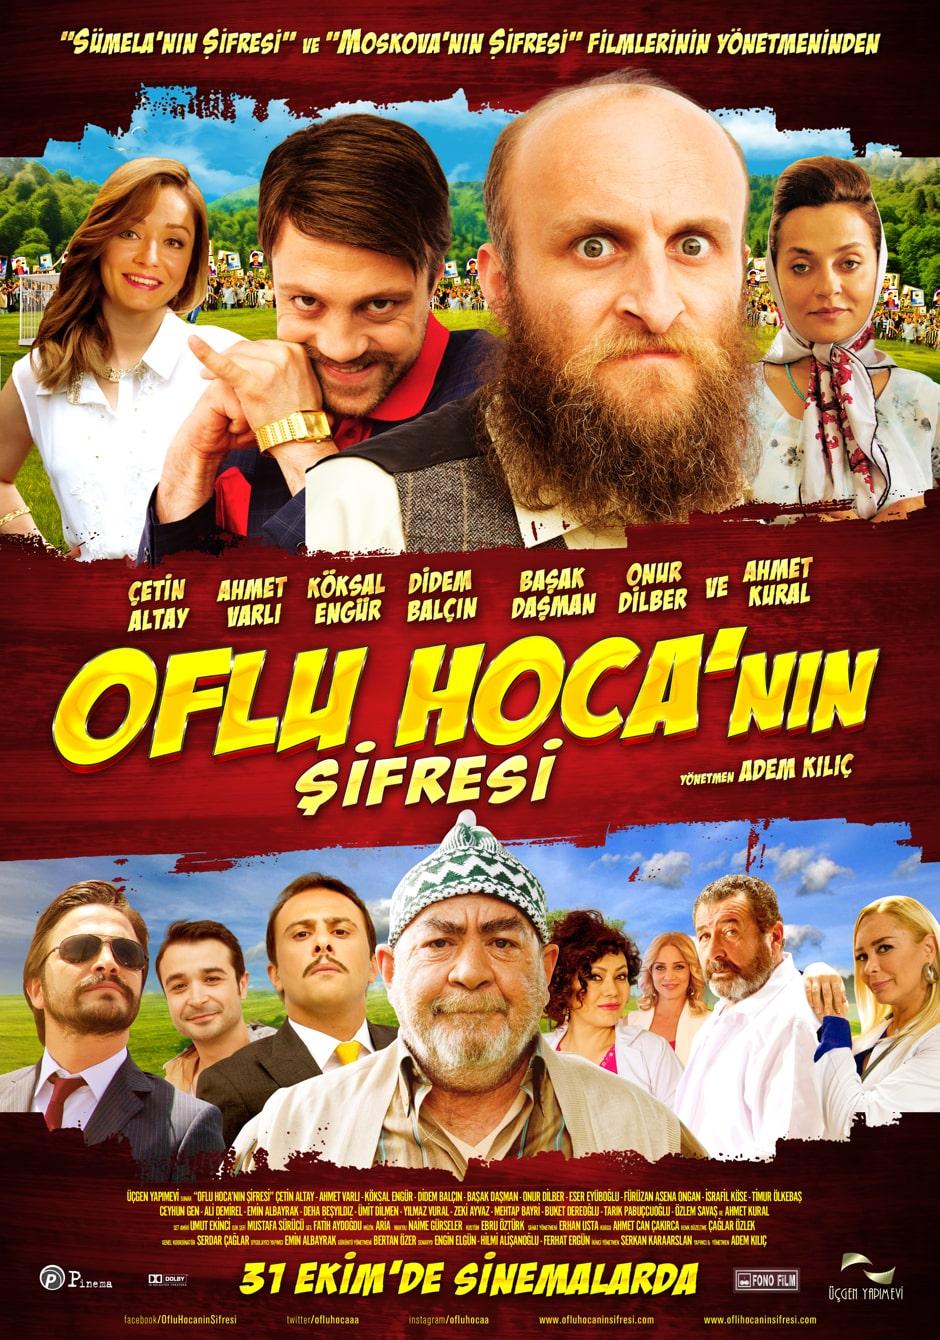 OFLU_HOCANIN-SIFRESI Copy-min